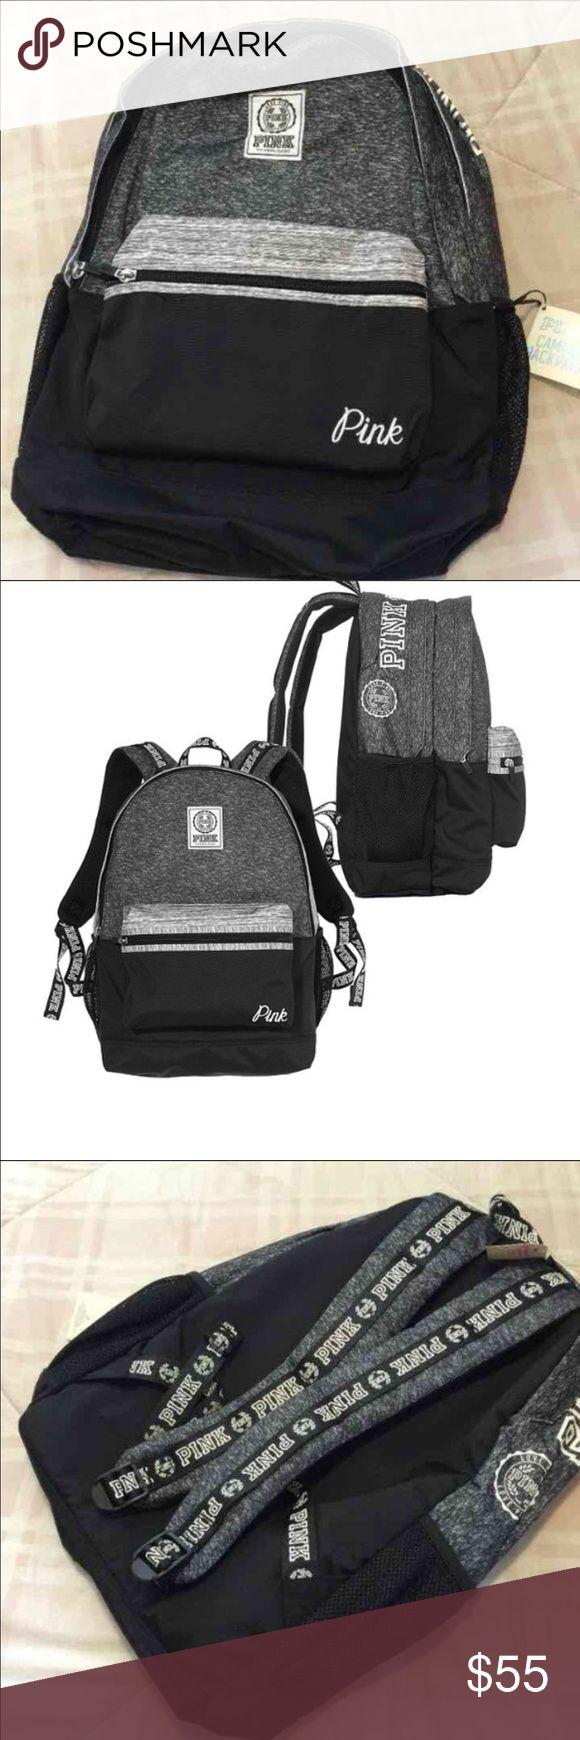 NWT Victoria Secret Pink Backpack Brand new with tag PINK Victoria's Secret Bags Backpacks